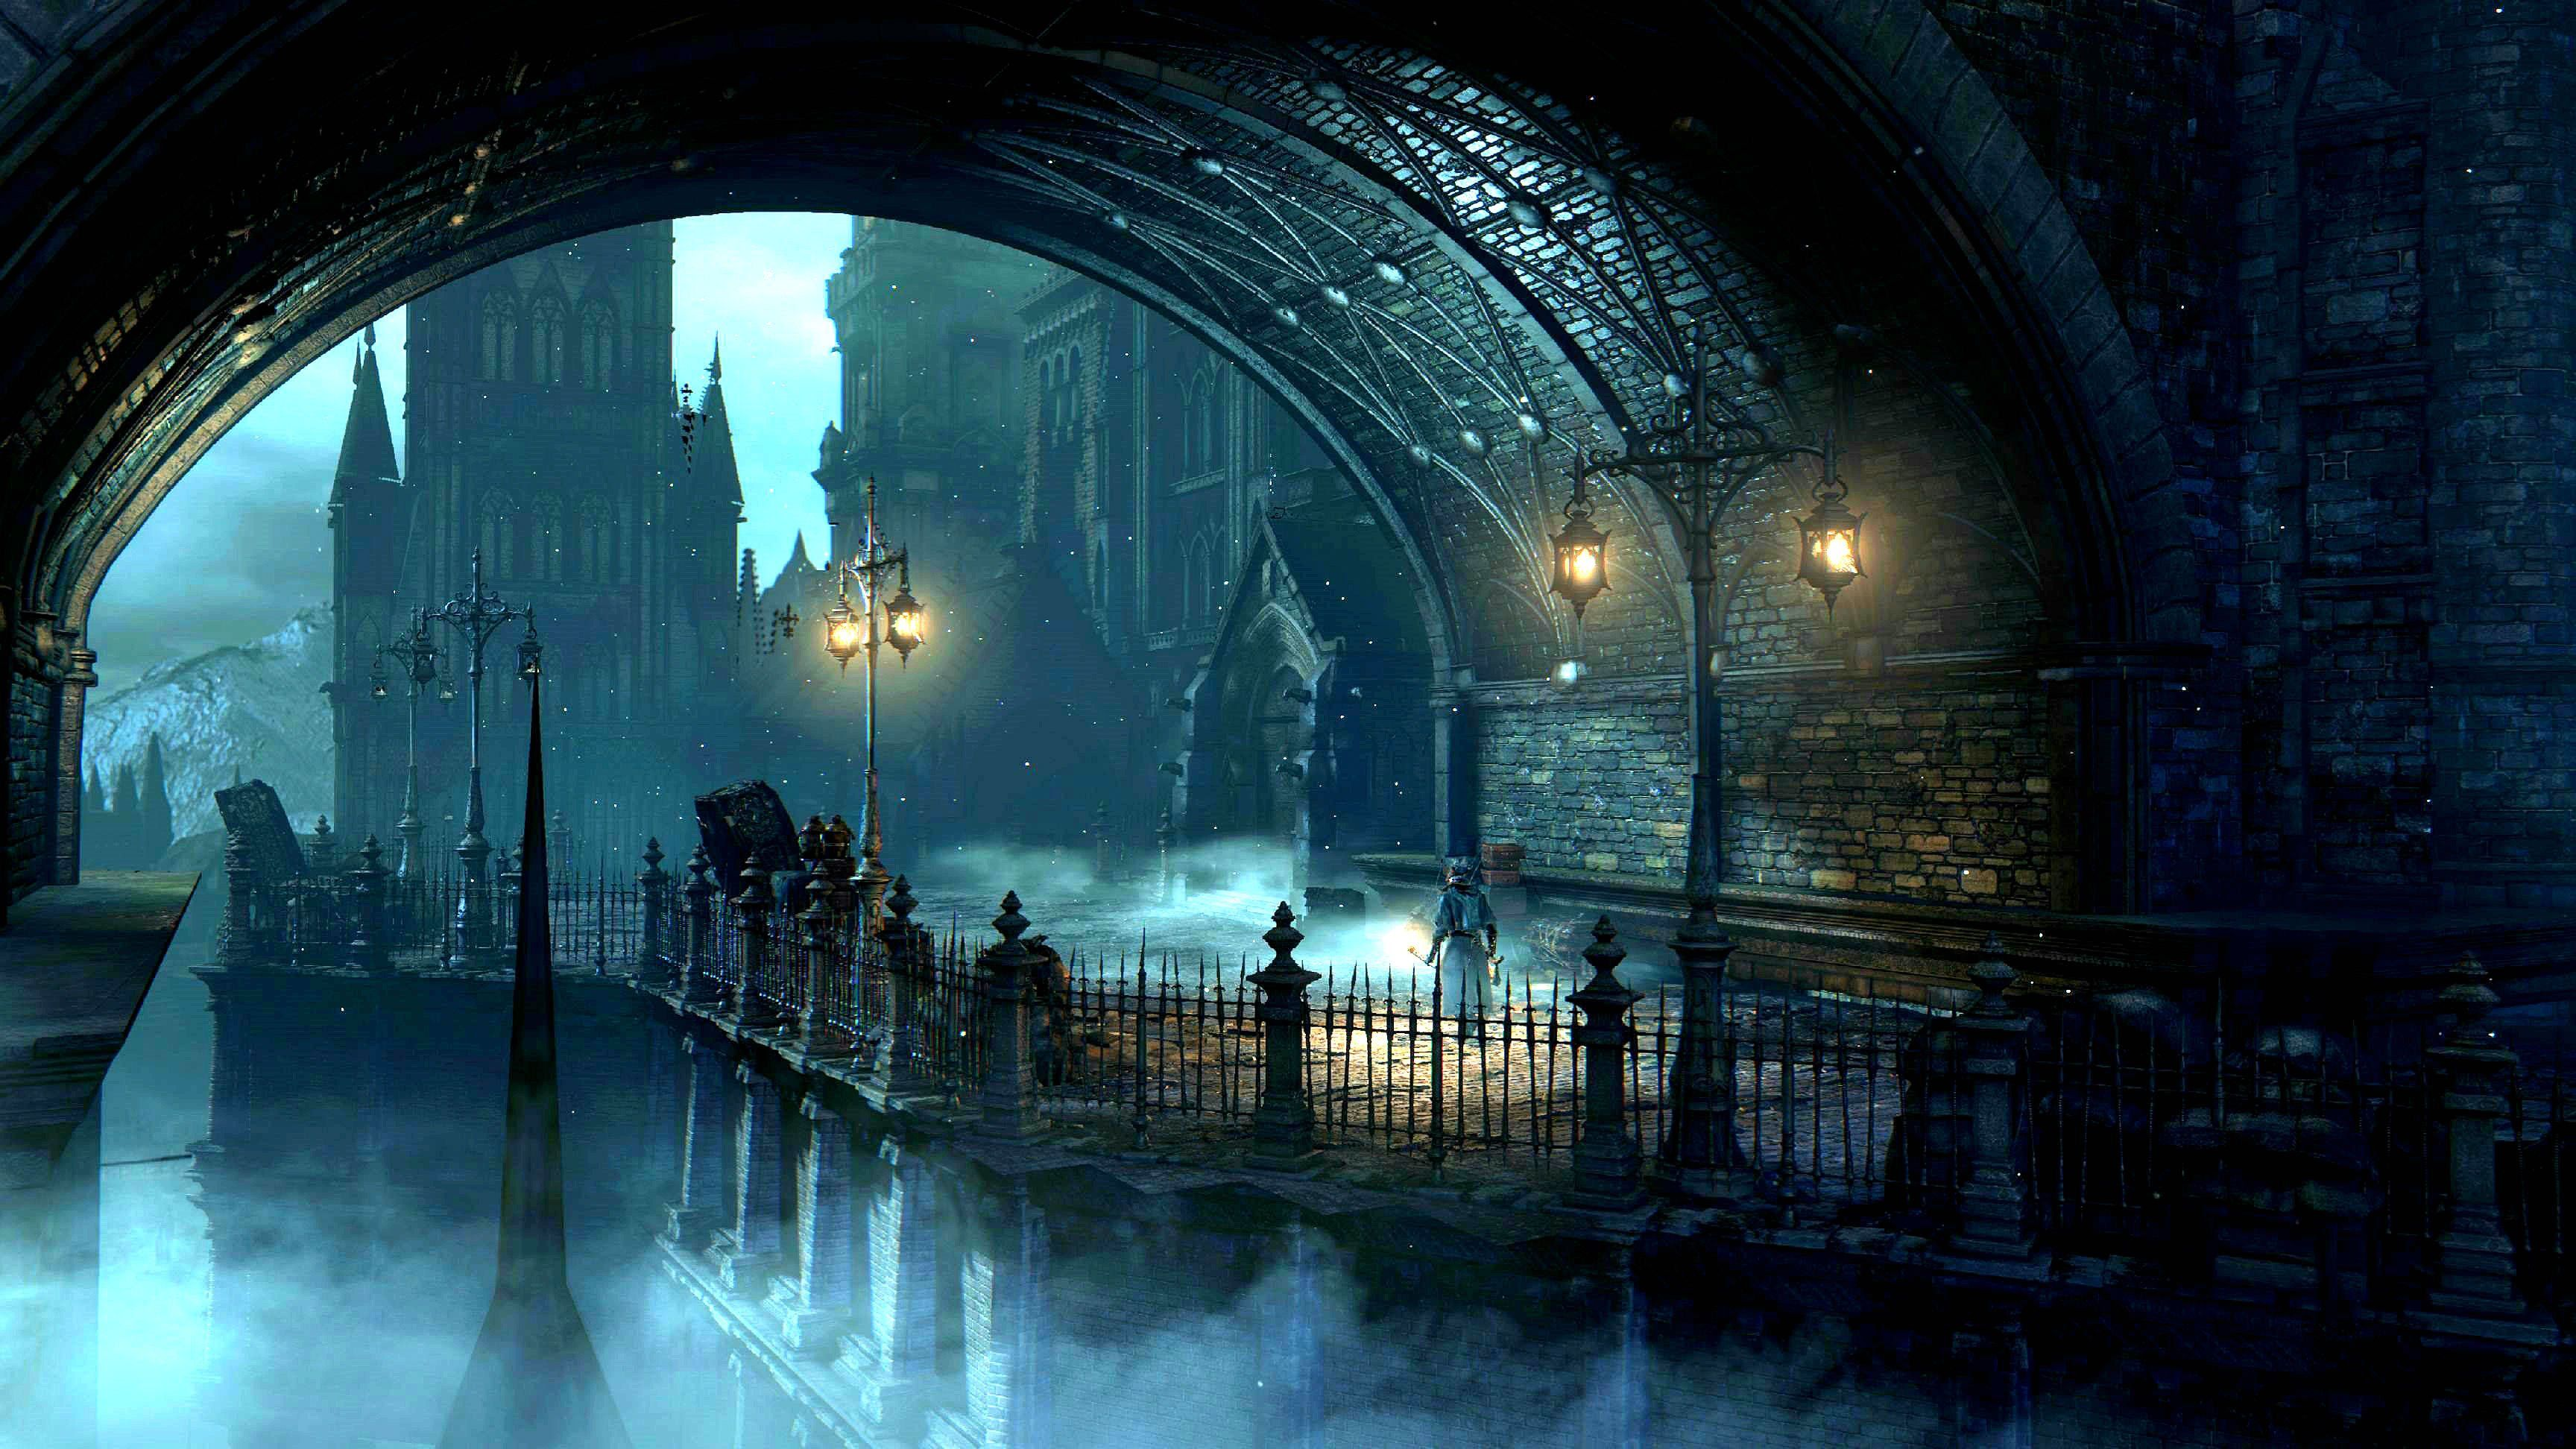 Bloodborne Rpg Action Fighting Gothic Survival Apocalyptic Dark